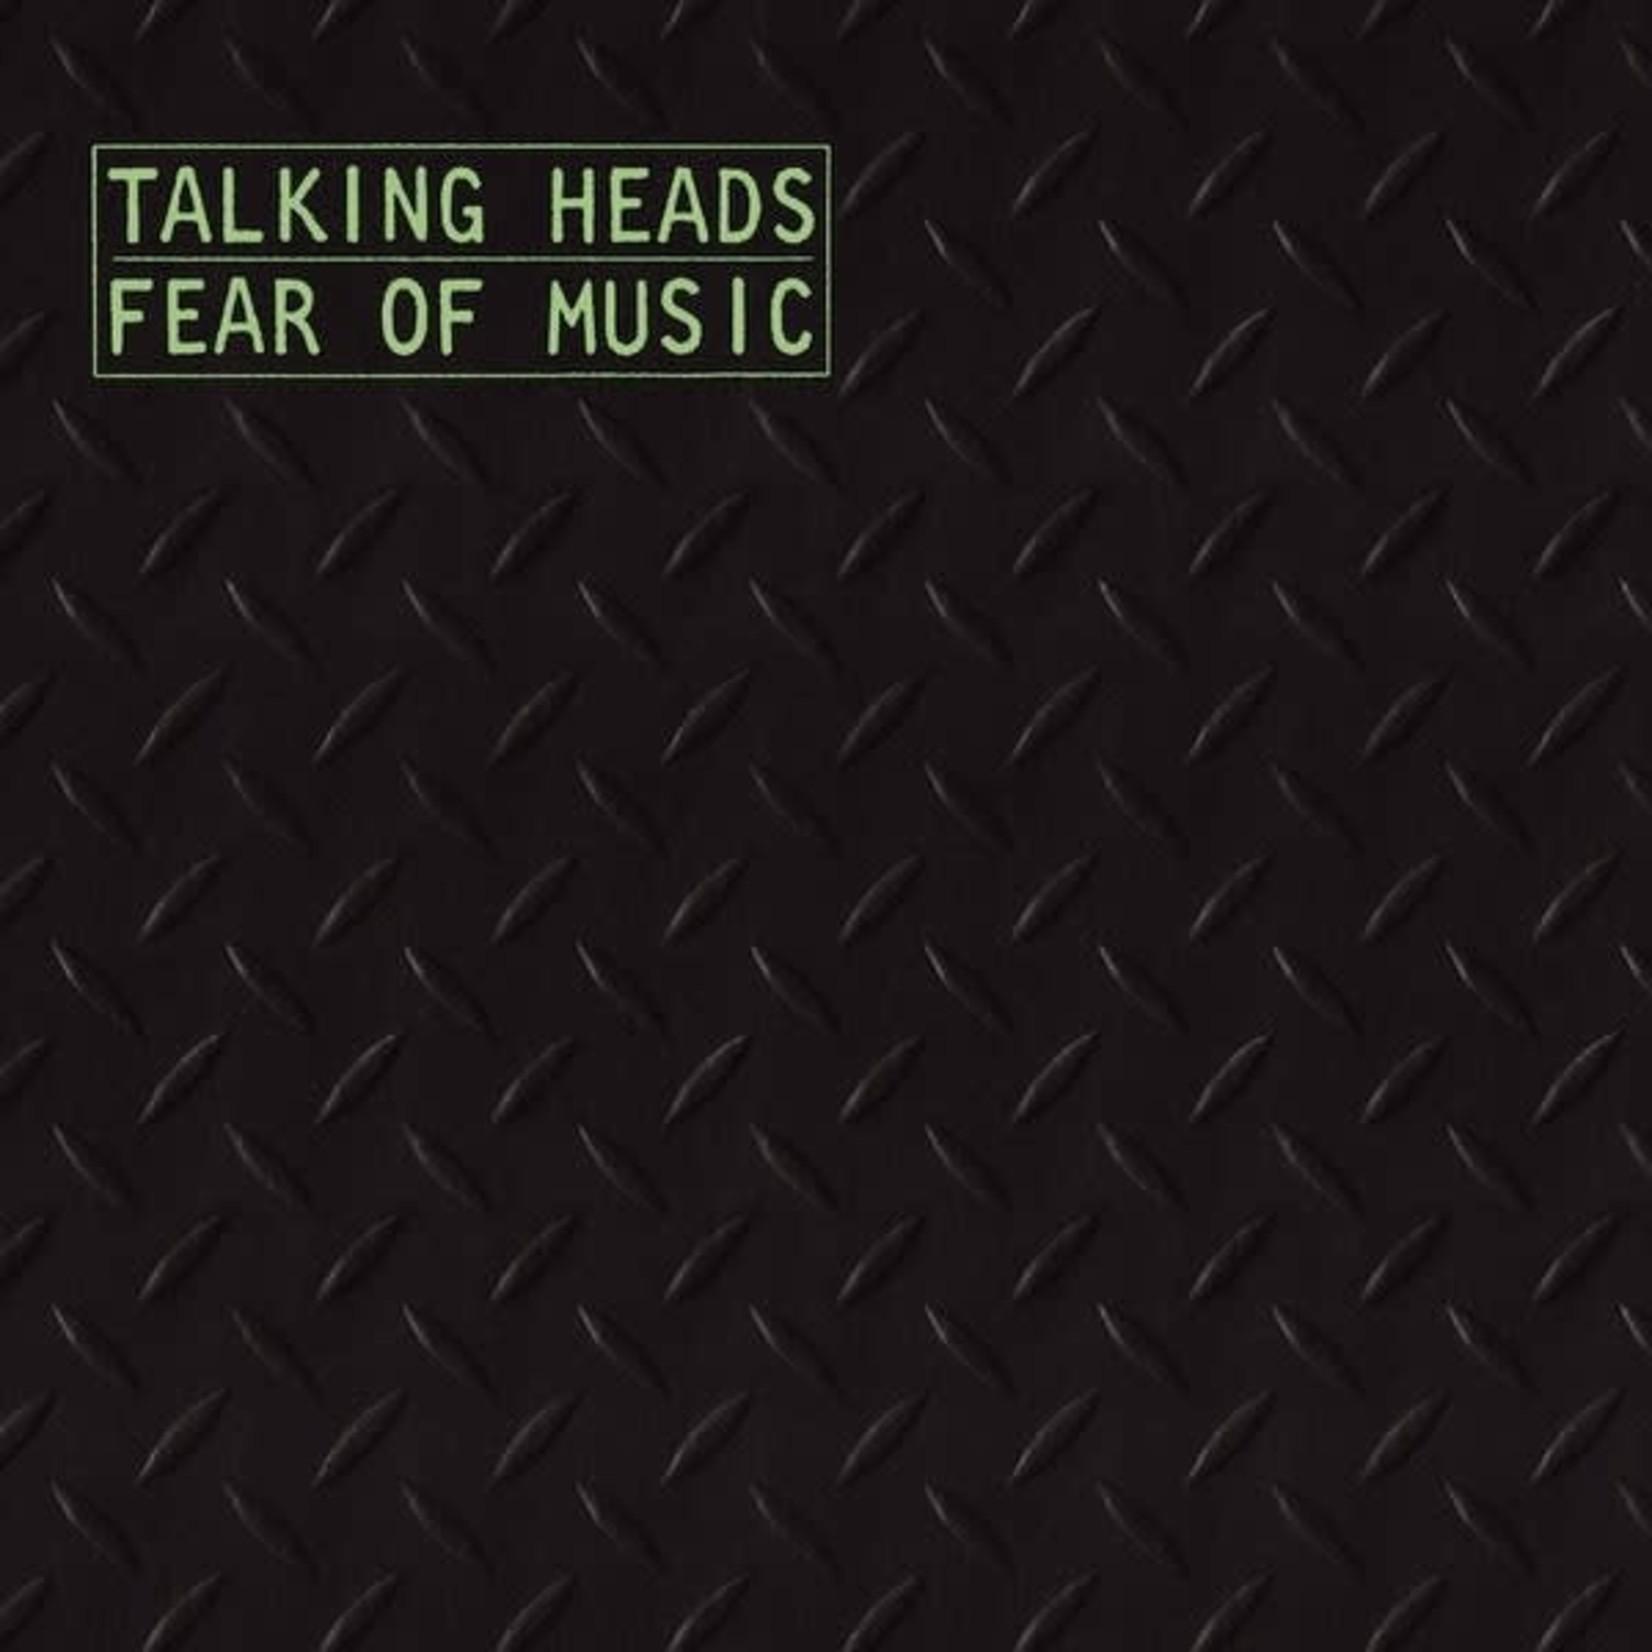 [Vintage] Talking Heads: Fear of Music